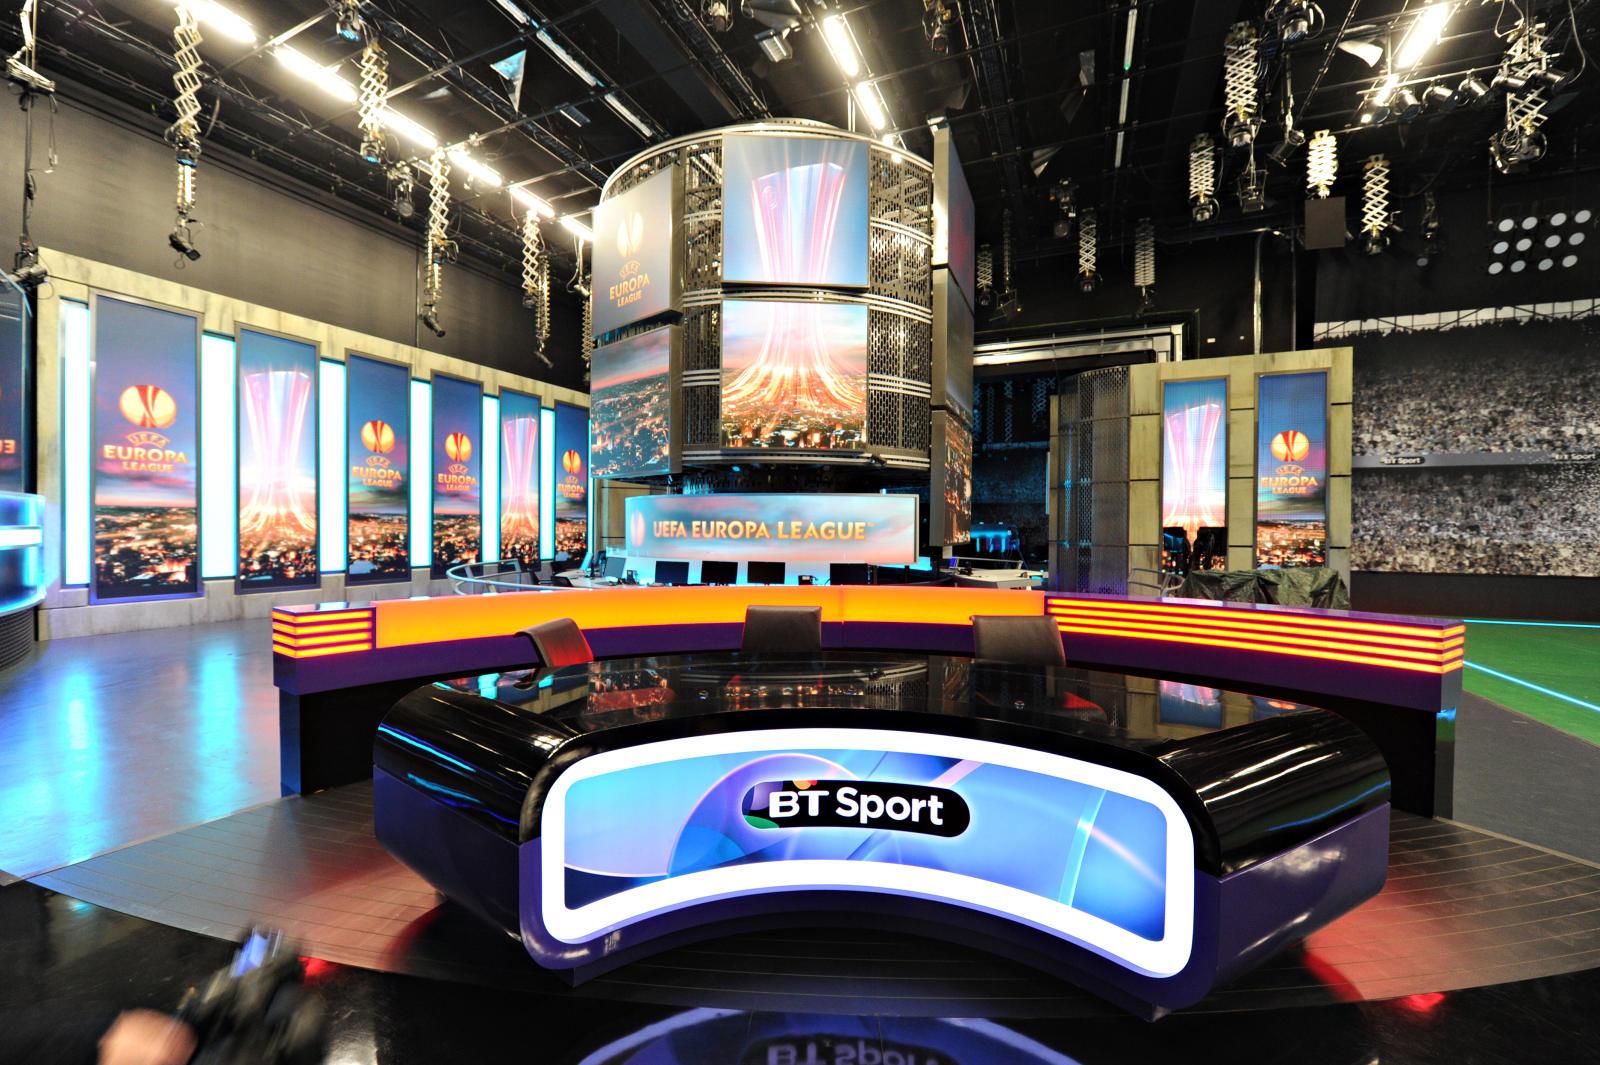 BT Sport studio tour